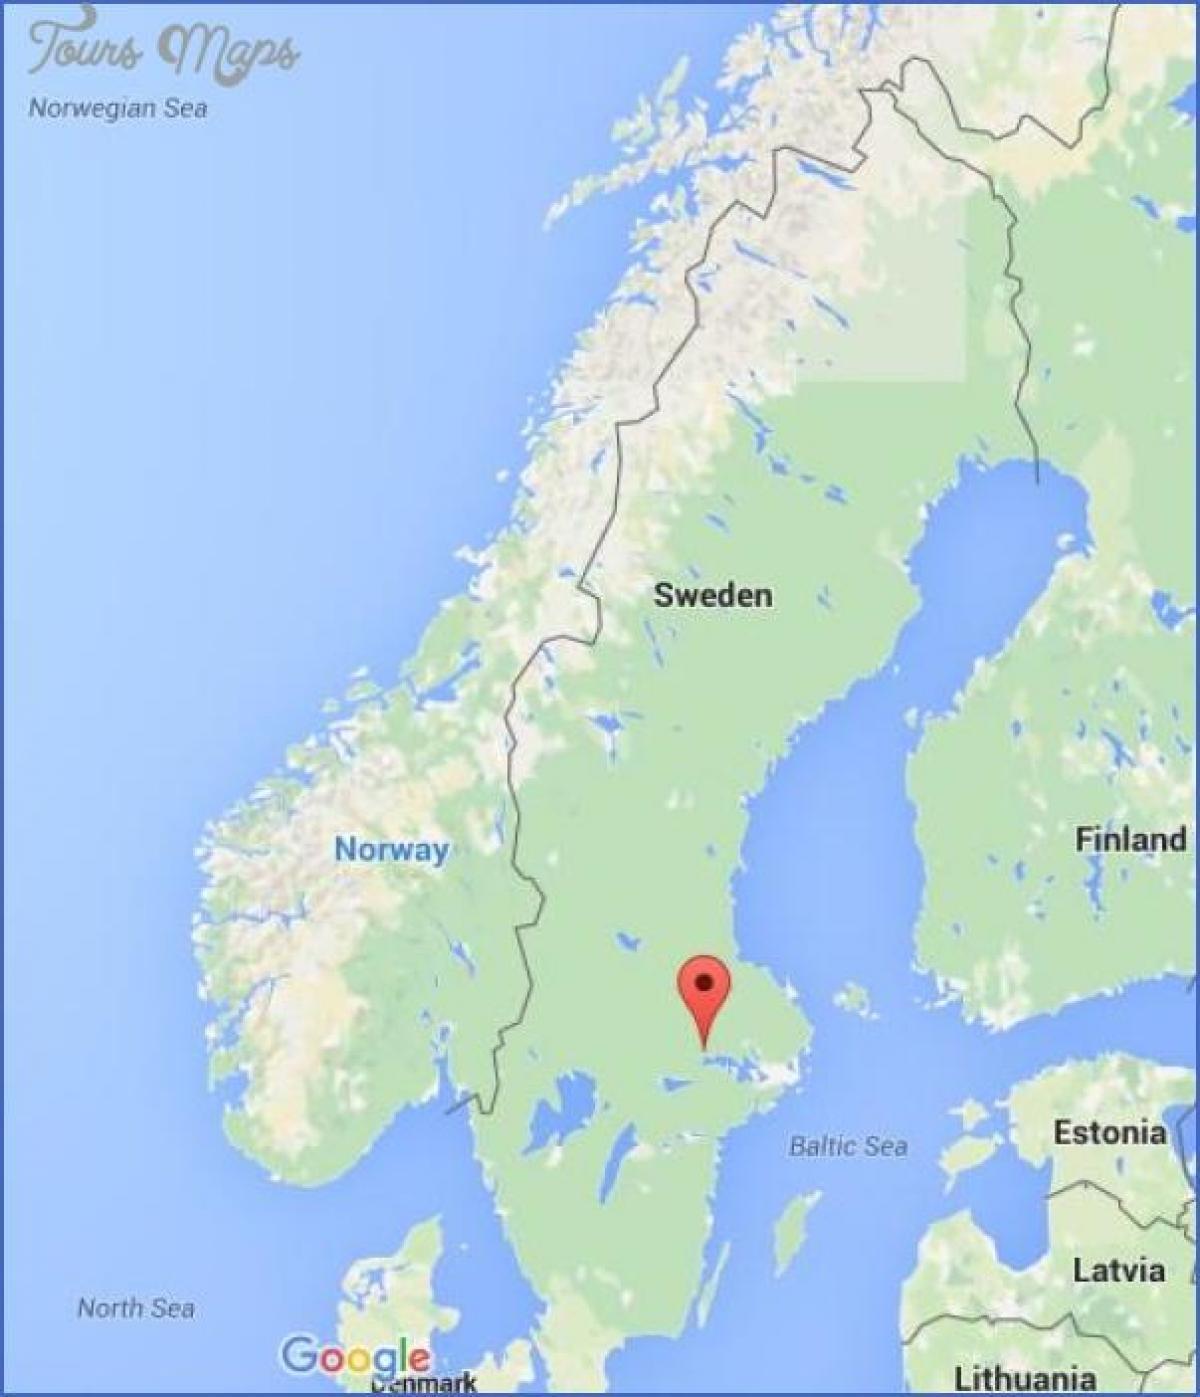 vesterås sverige kart Västerås Sverige kart   Kart over Västerås i Sverige (Nord Europa  vesterås sverige kart